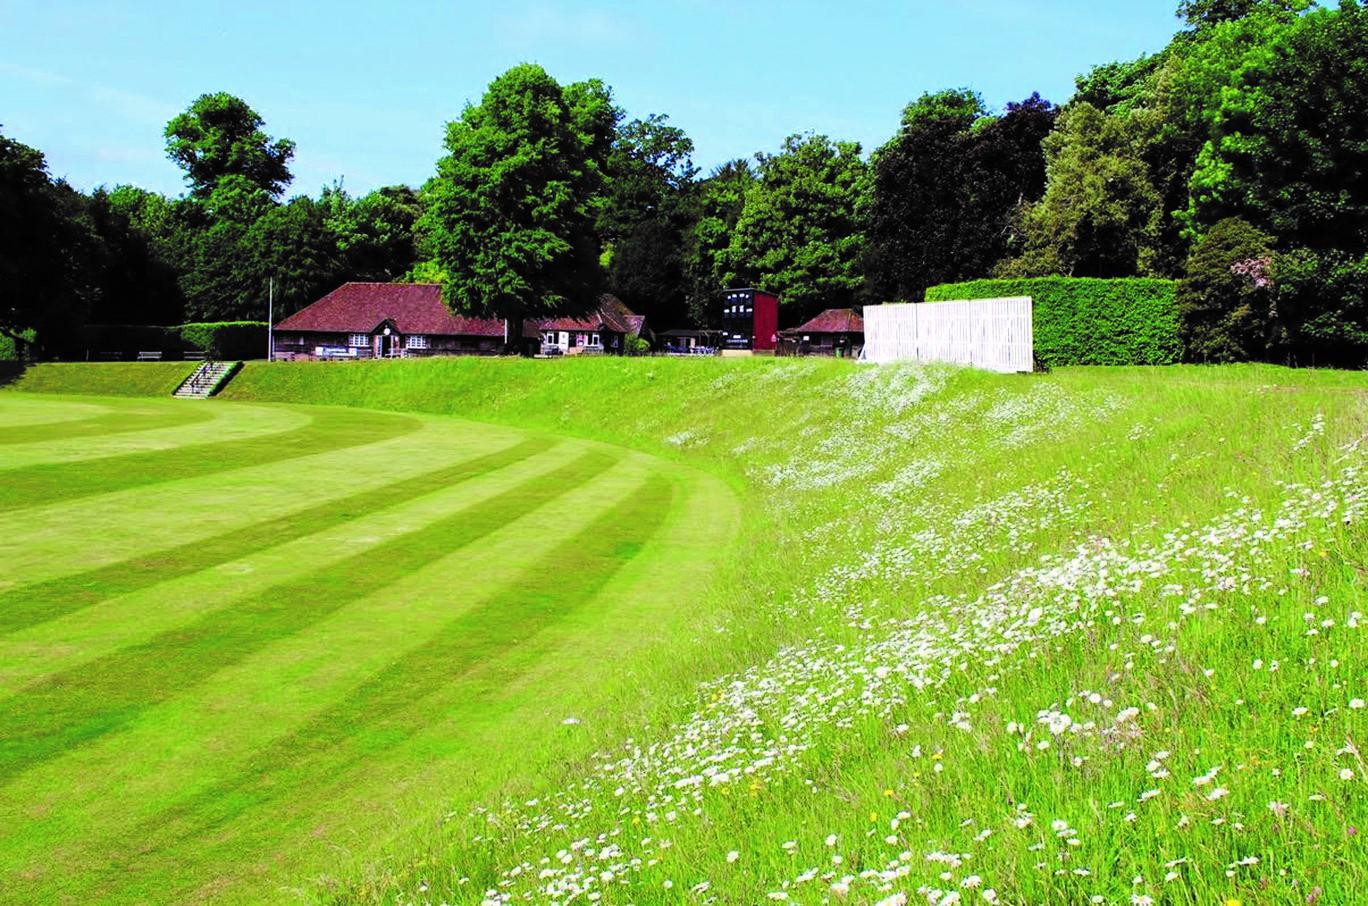 Lush cricket ground photo